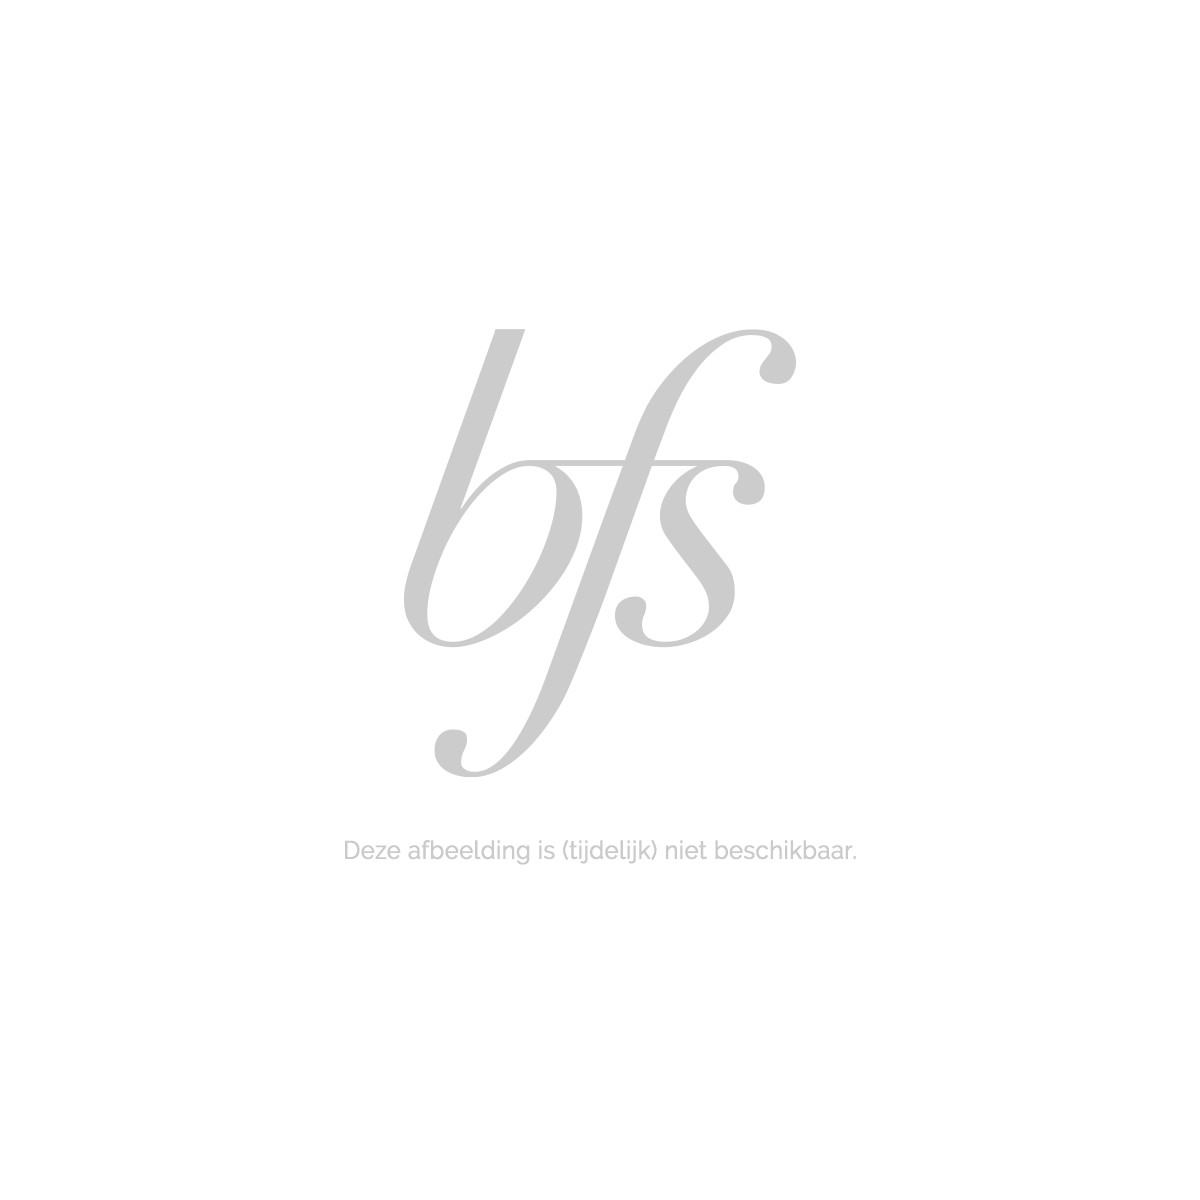 Estee Lauder Sumptuous Knockout Mascara Set 16,80 Ml